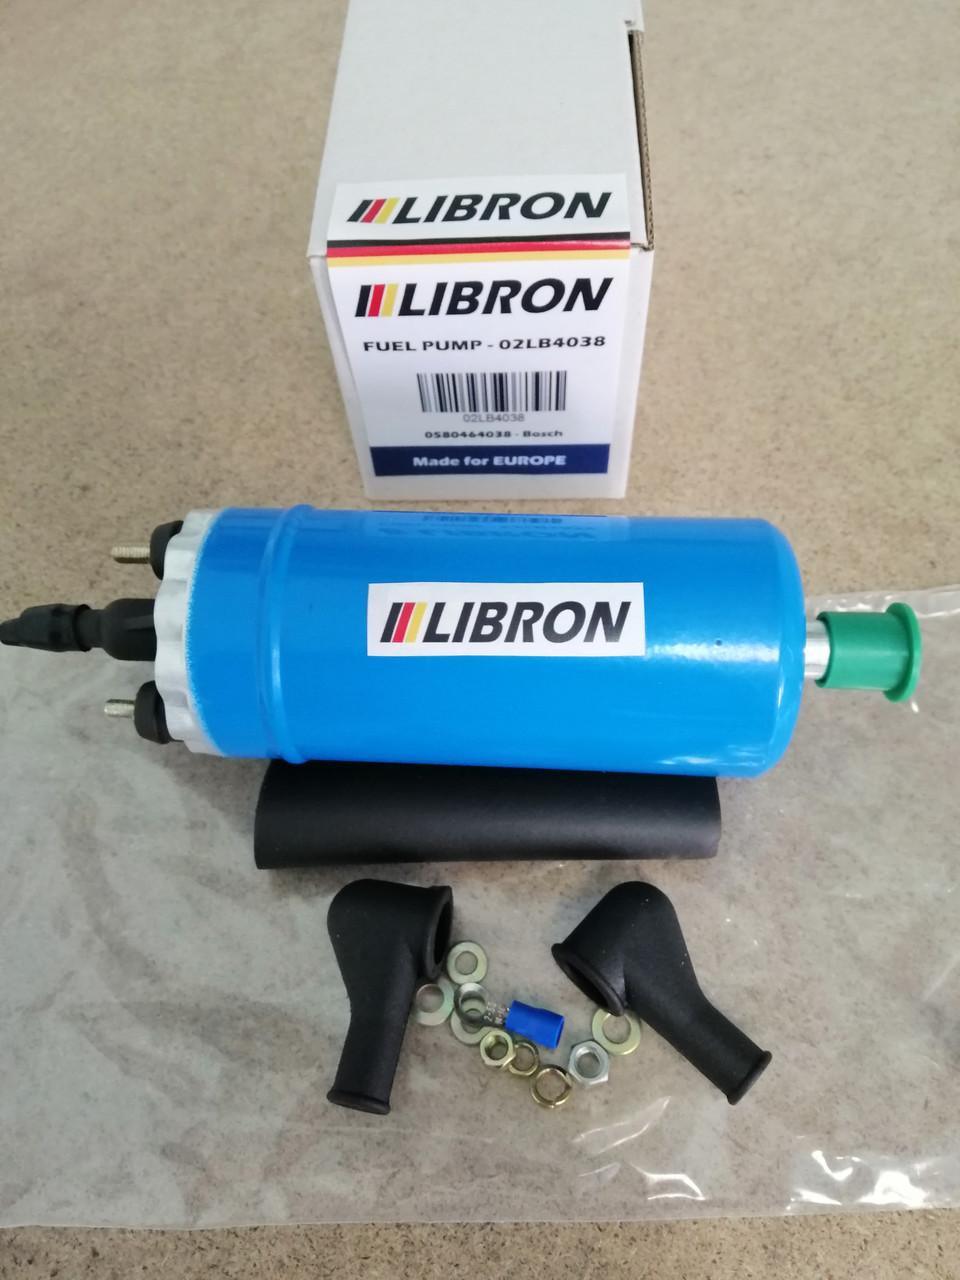 Бензонасос LIBRON 02LB4038 - LANCIA GAMMA купе 2500 (1981-1984)